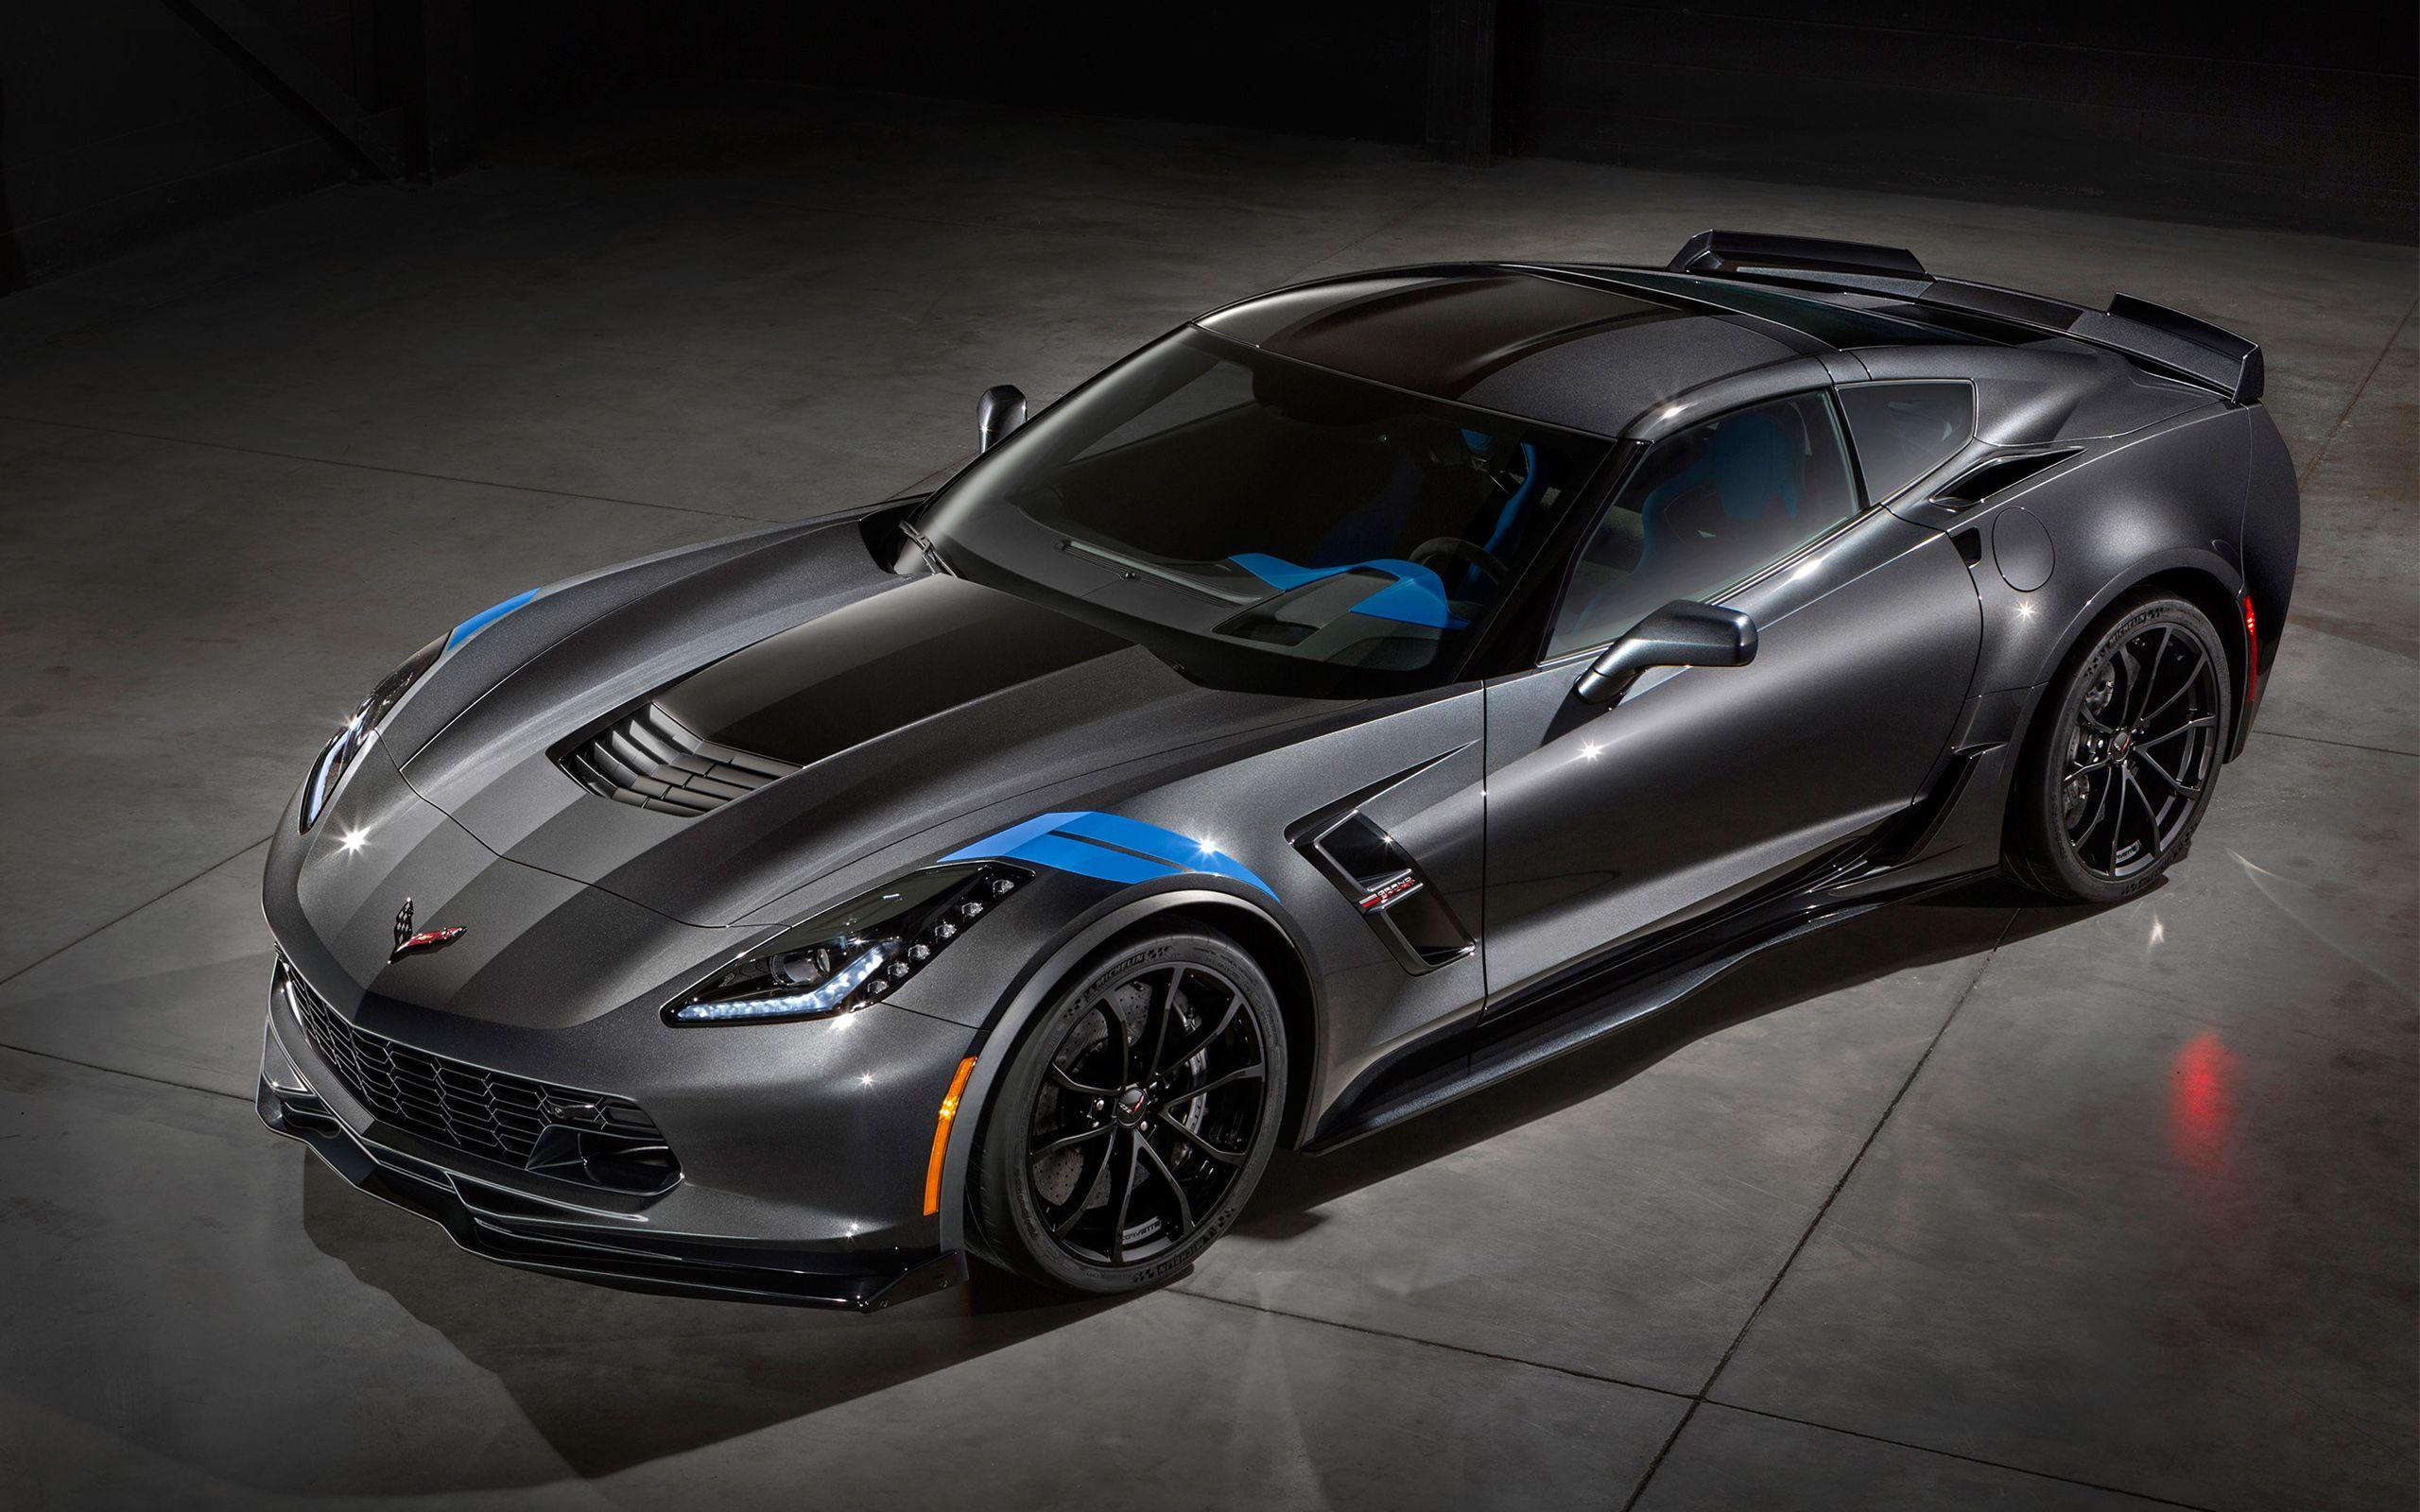 2017 Corvette Wallpapers   Top 2017 Corvette Backgrounds 2560x1600